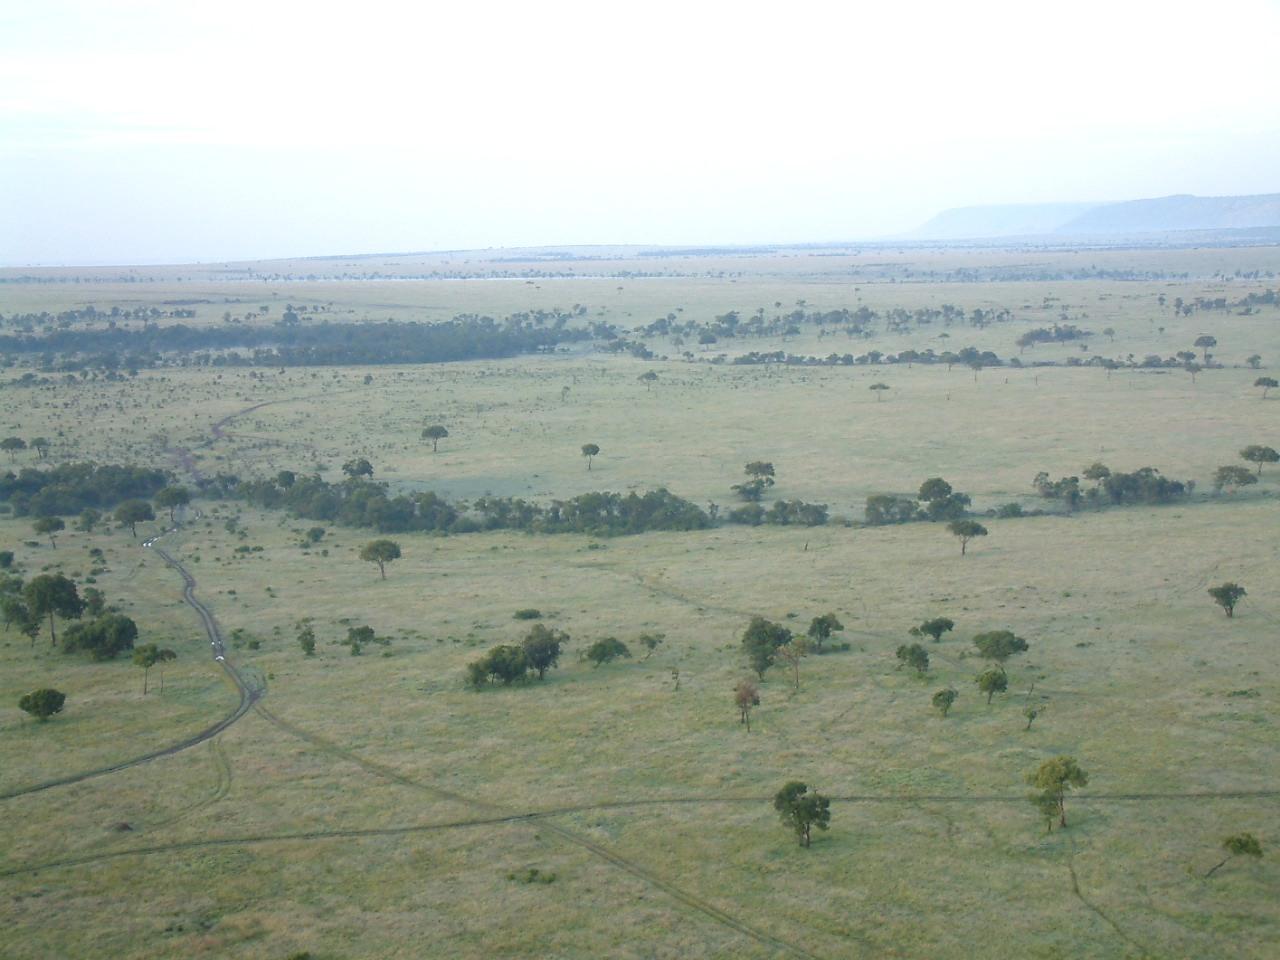 Ökosystem Serengeti (Quelle: Ralf Krüger)